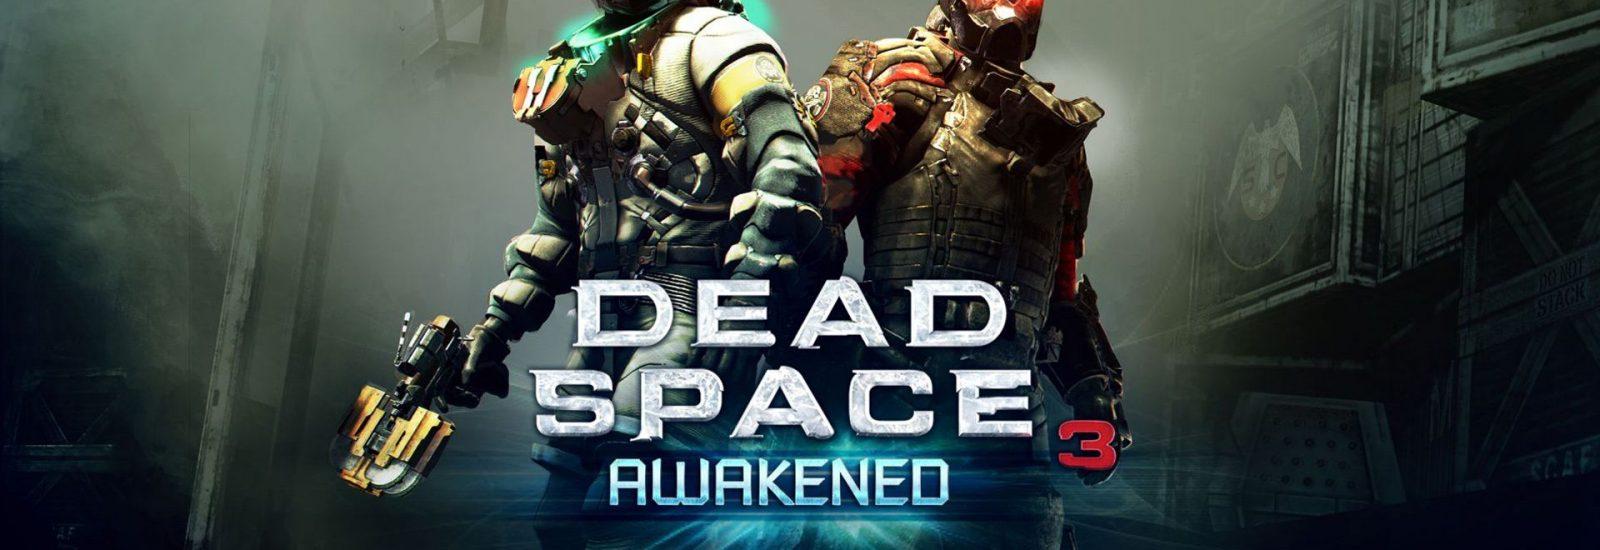 Dead Space 3 – Awakened